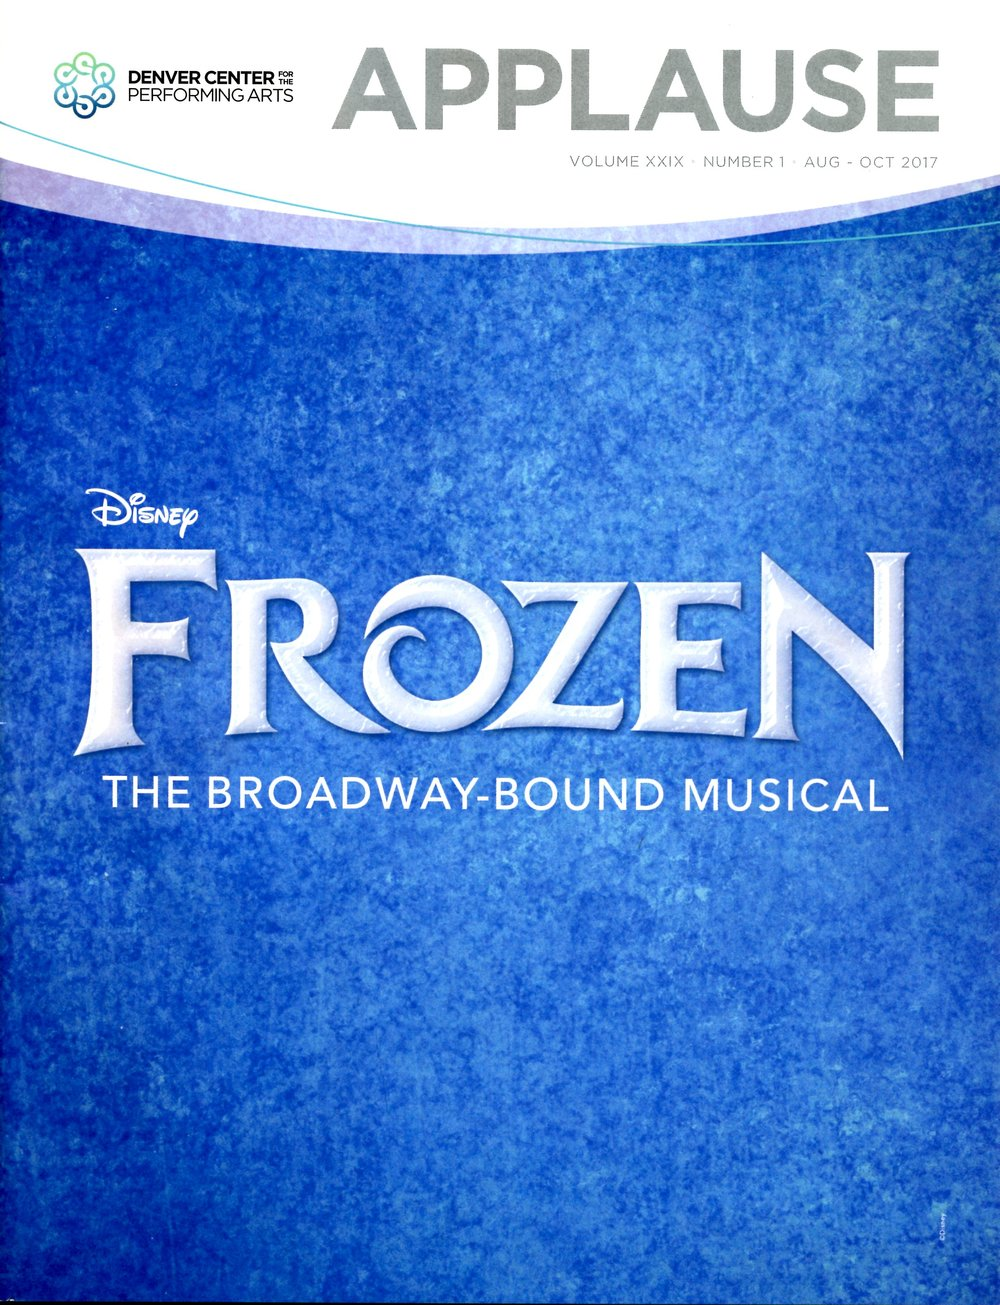 Denver  Applause  Frozen Edition